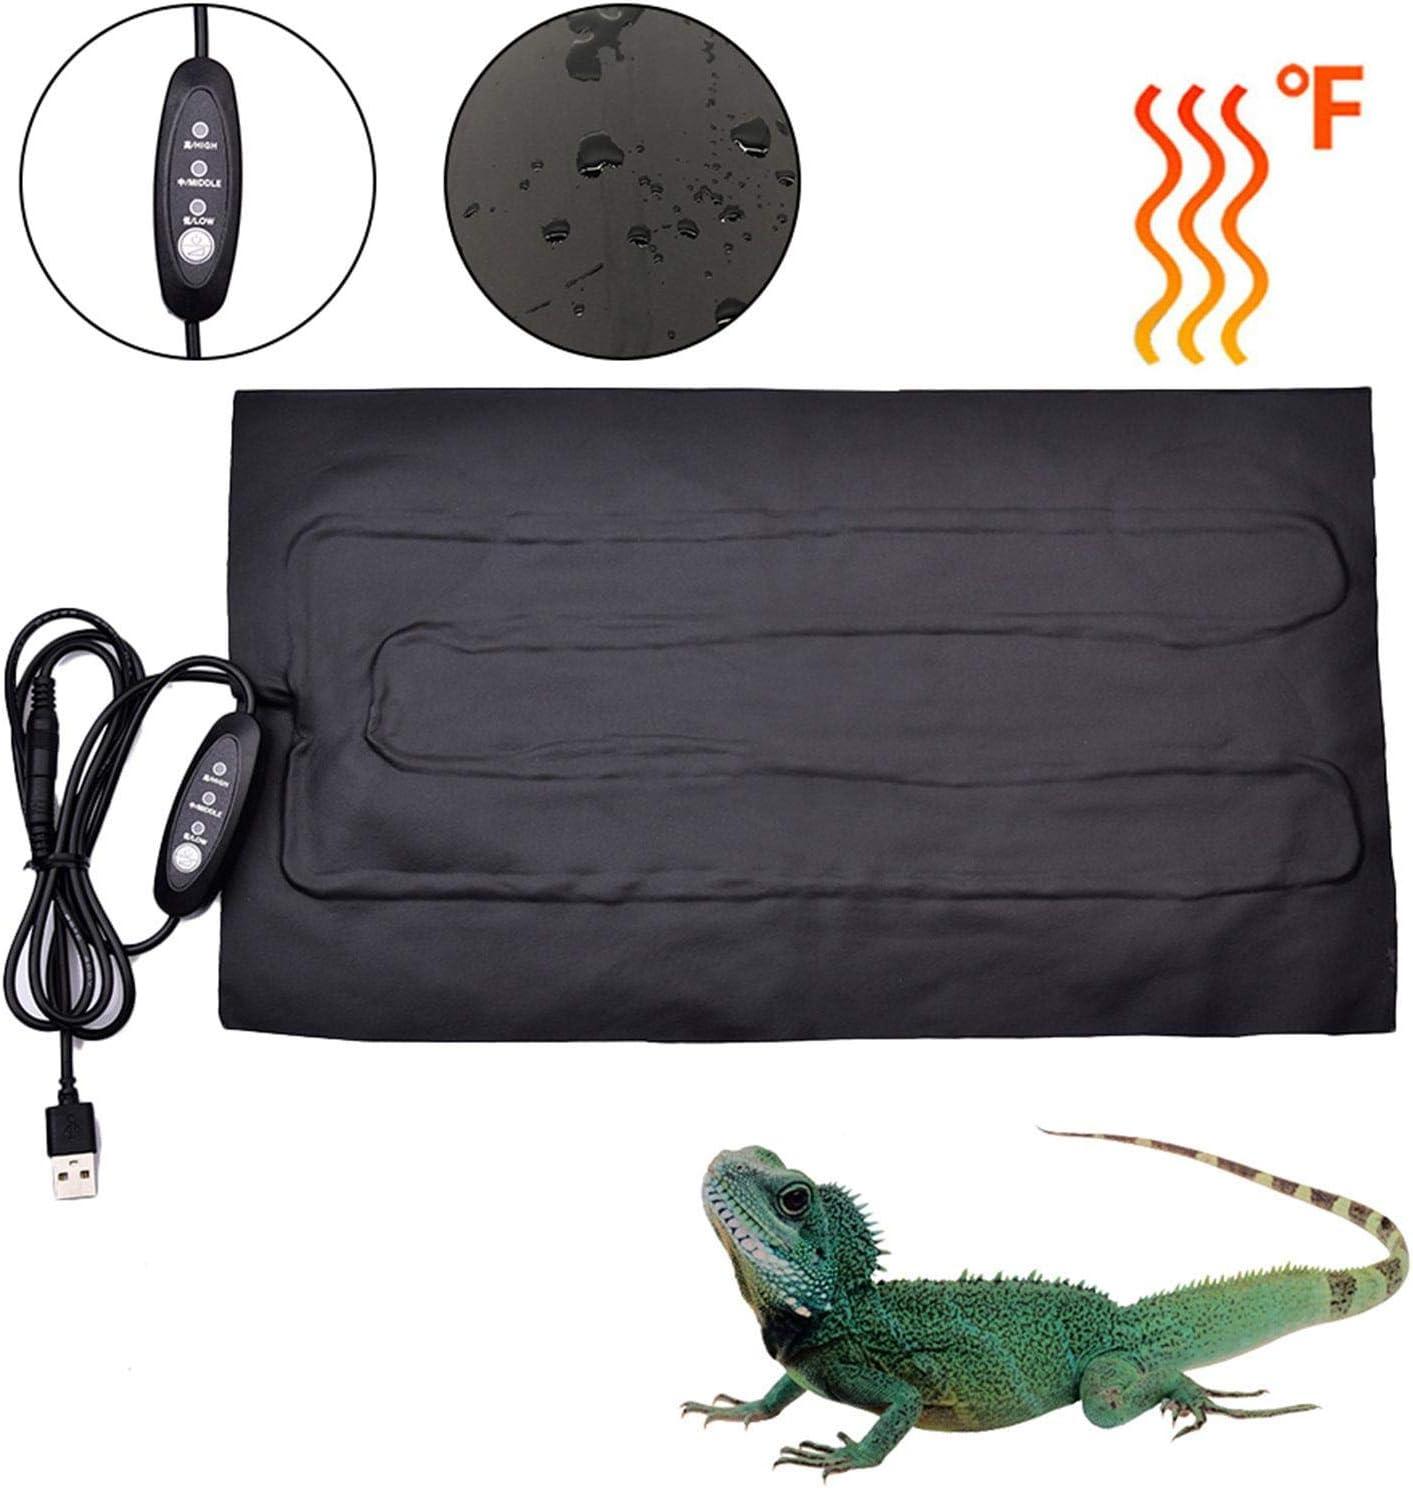 for Turtle Lizard Tortoise Gecko Terrarium Warmer Mat Pad with Temperature Control Reptile Heating Mat 8.5W 35X20cm Waterproof Safety Adjustable Vivarium Pet Tank Snakes